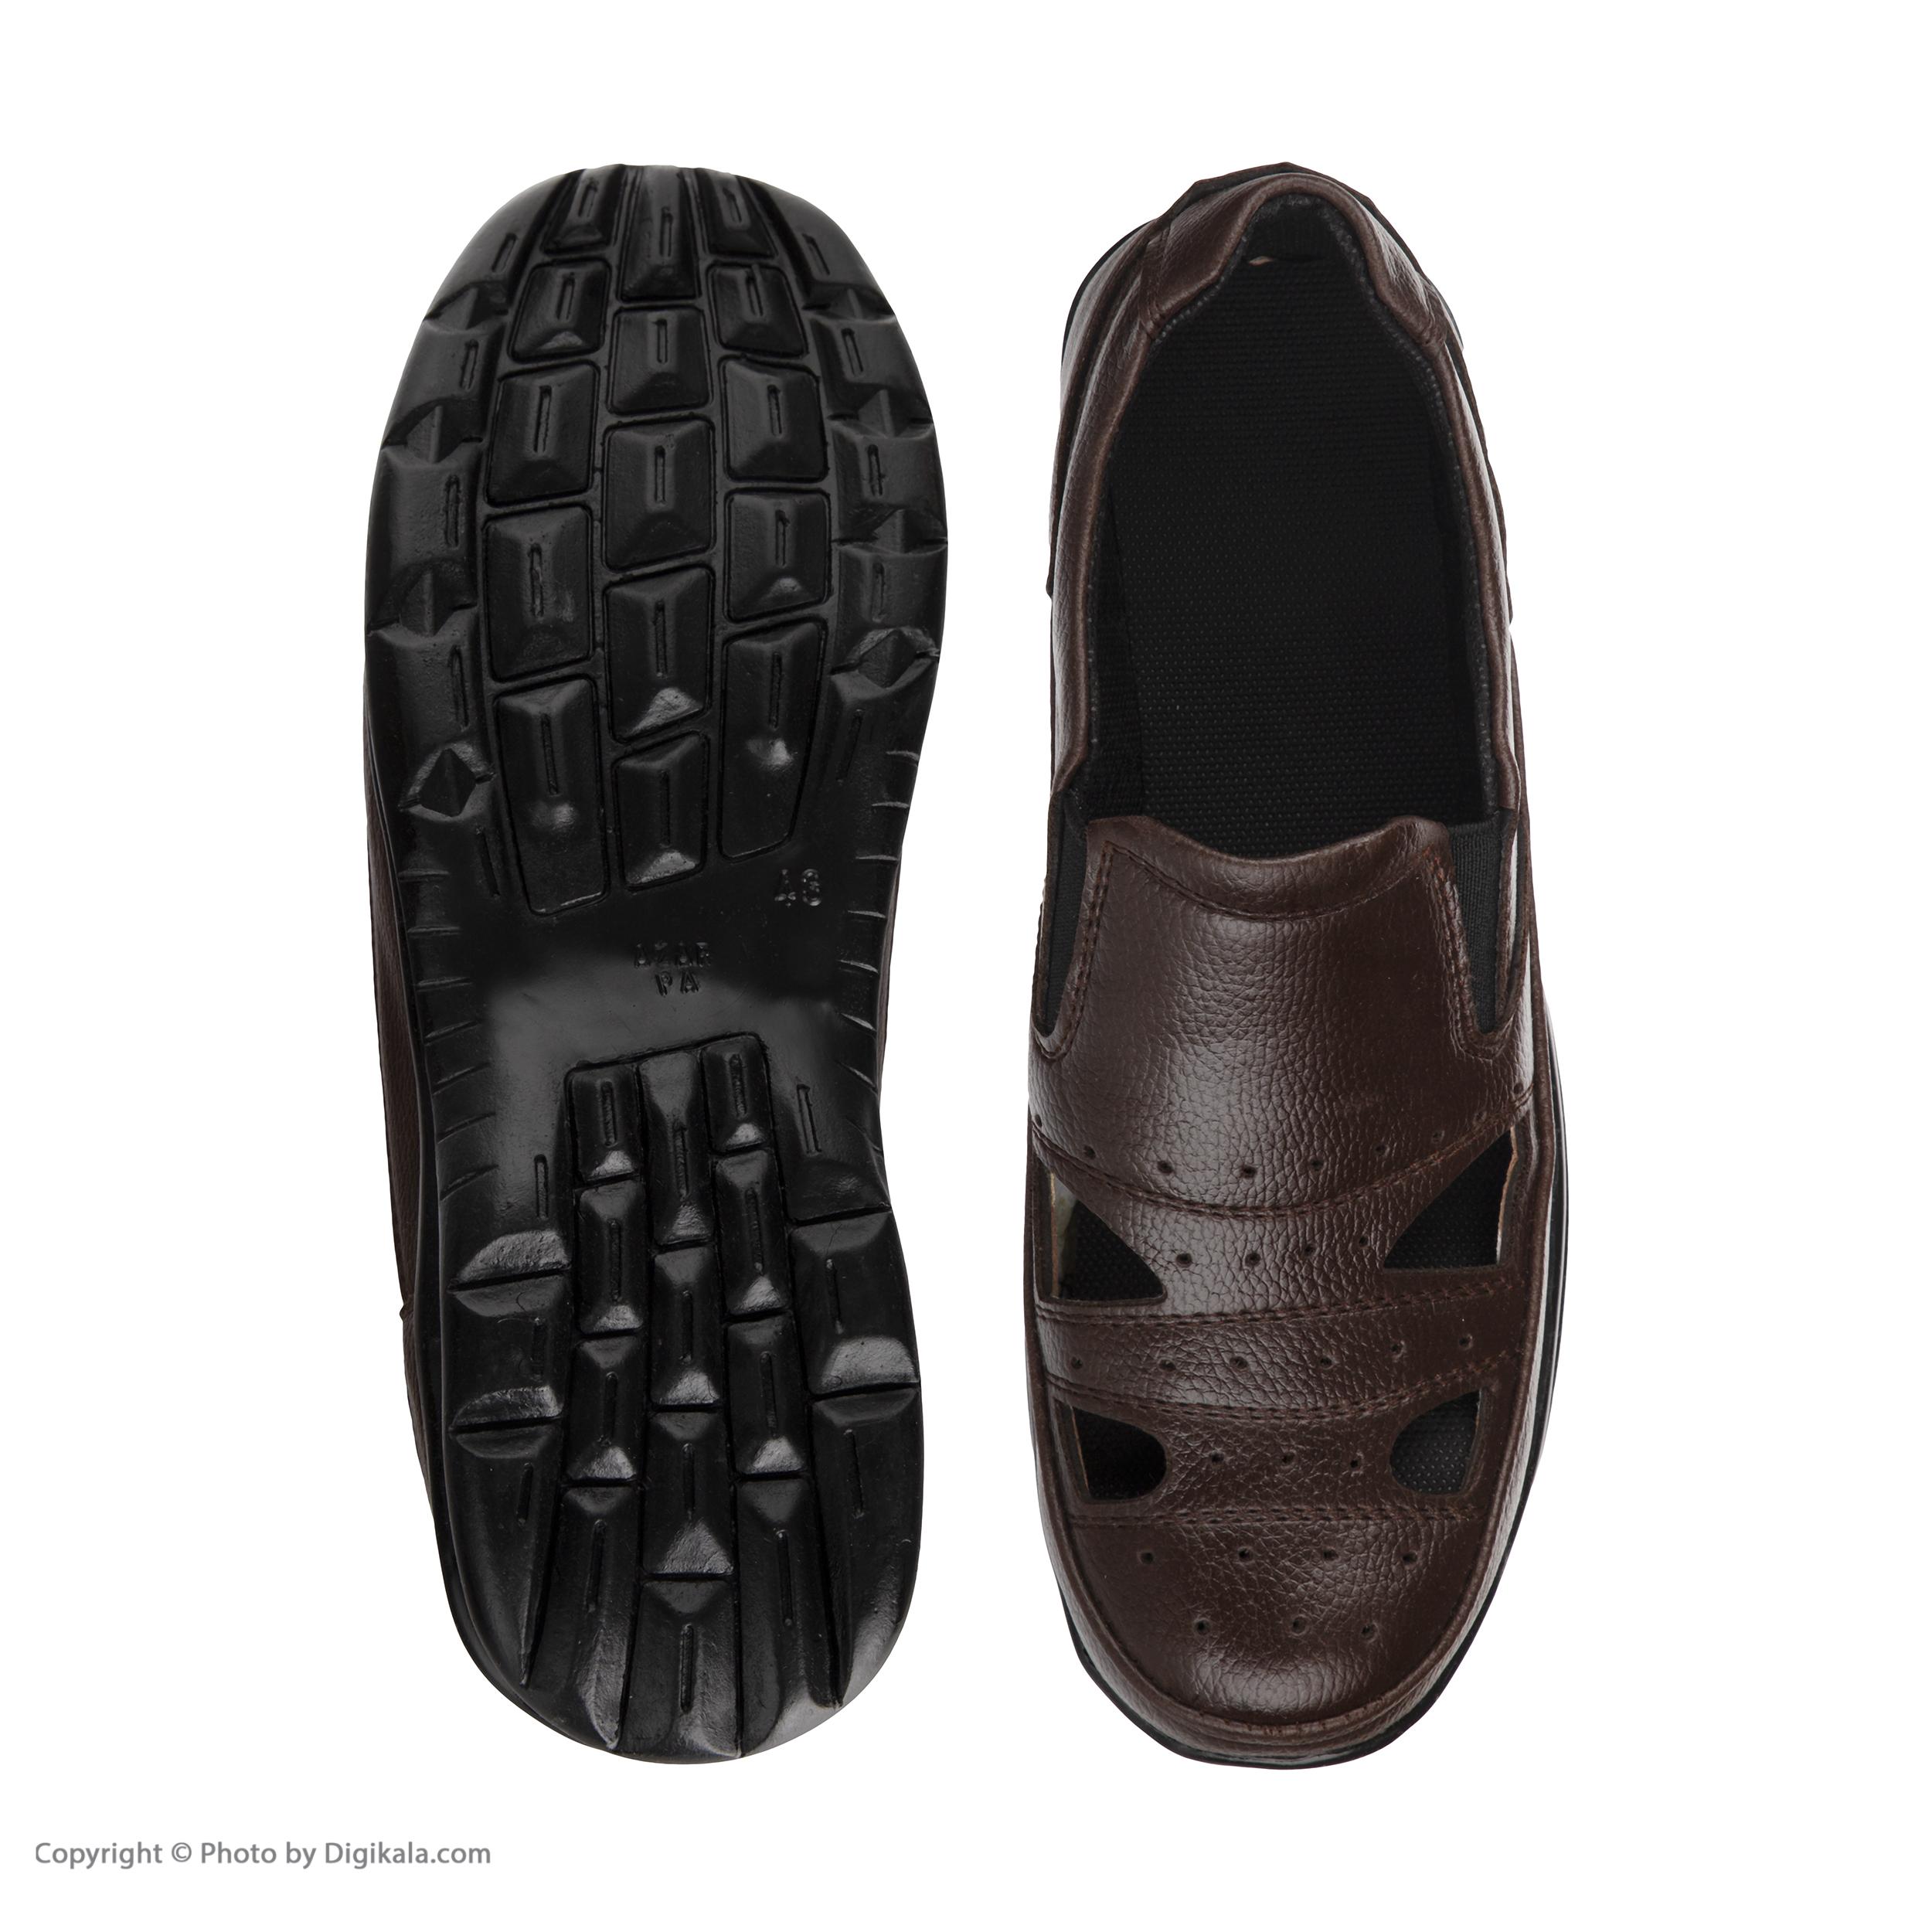 کفش روزمره مردانه مدل k.baz.076 -  - 5